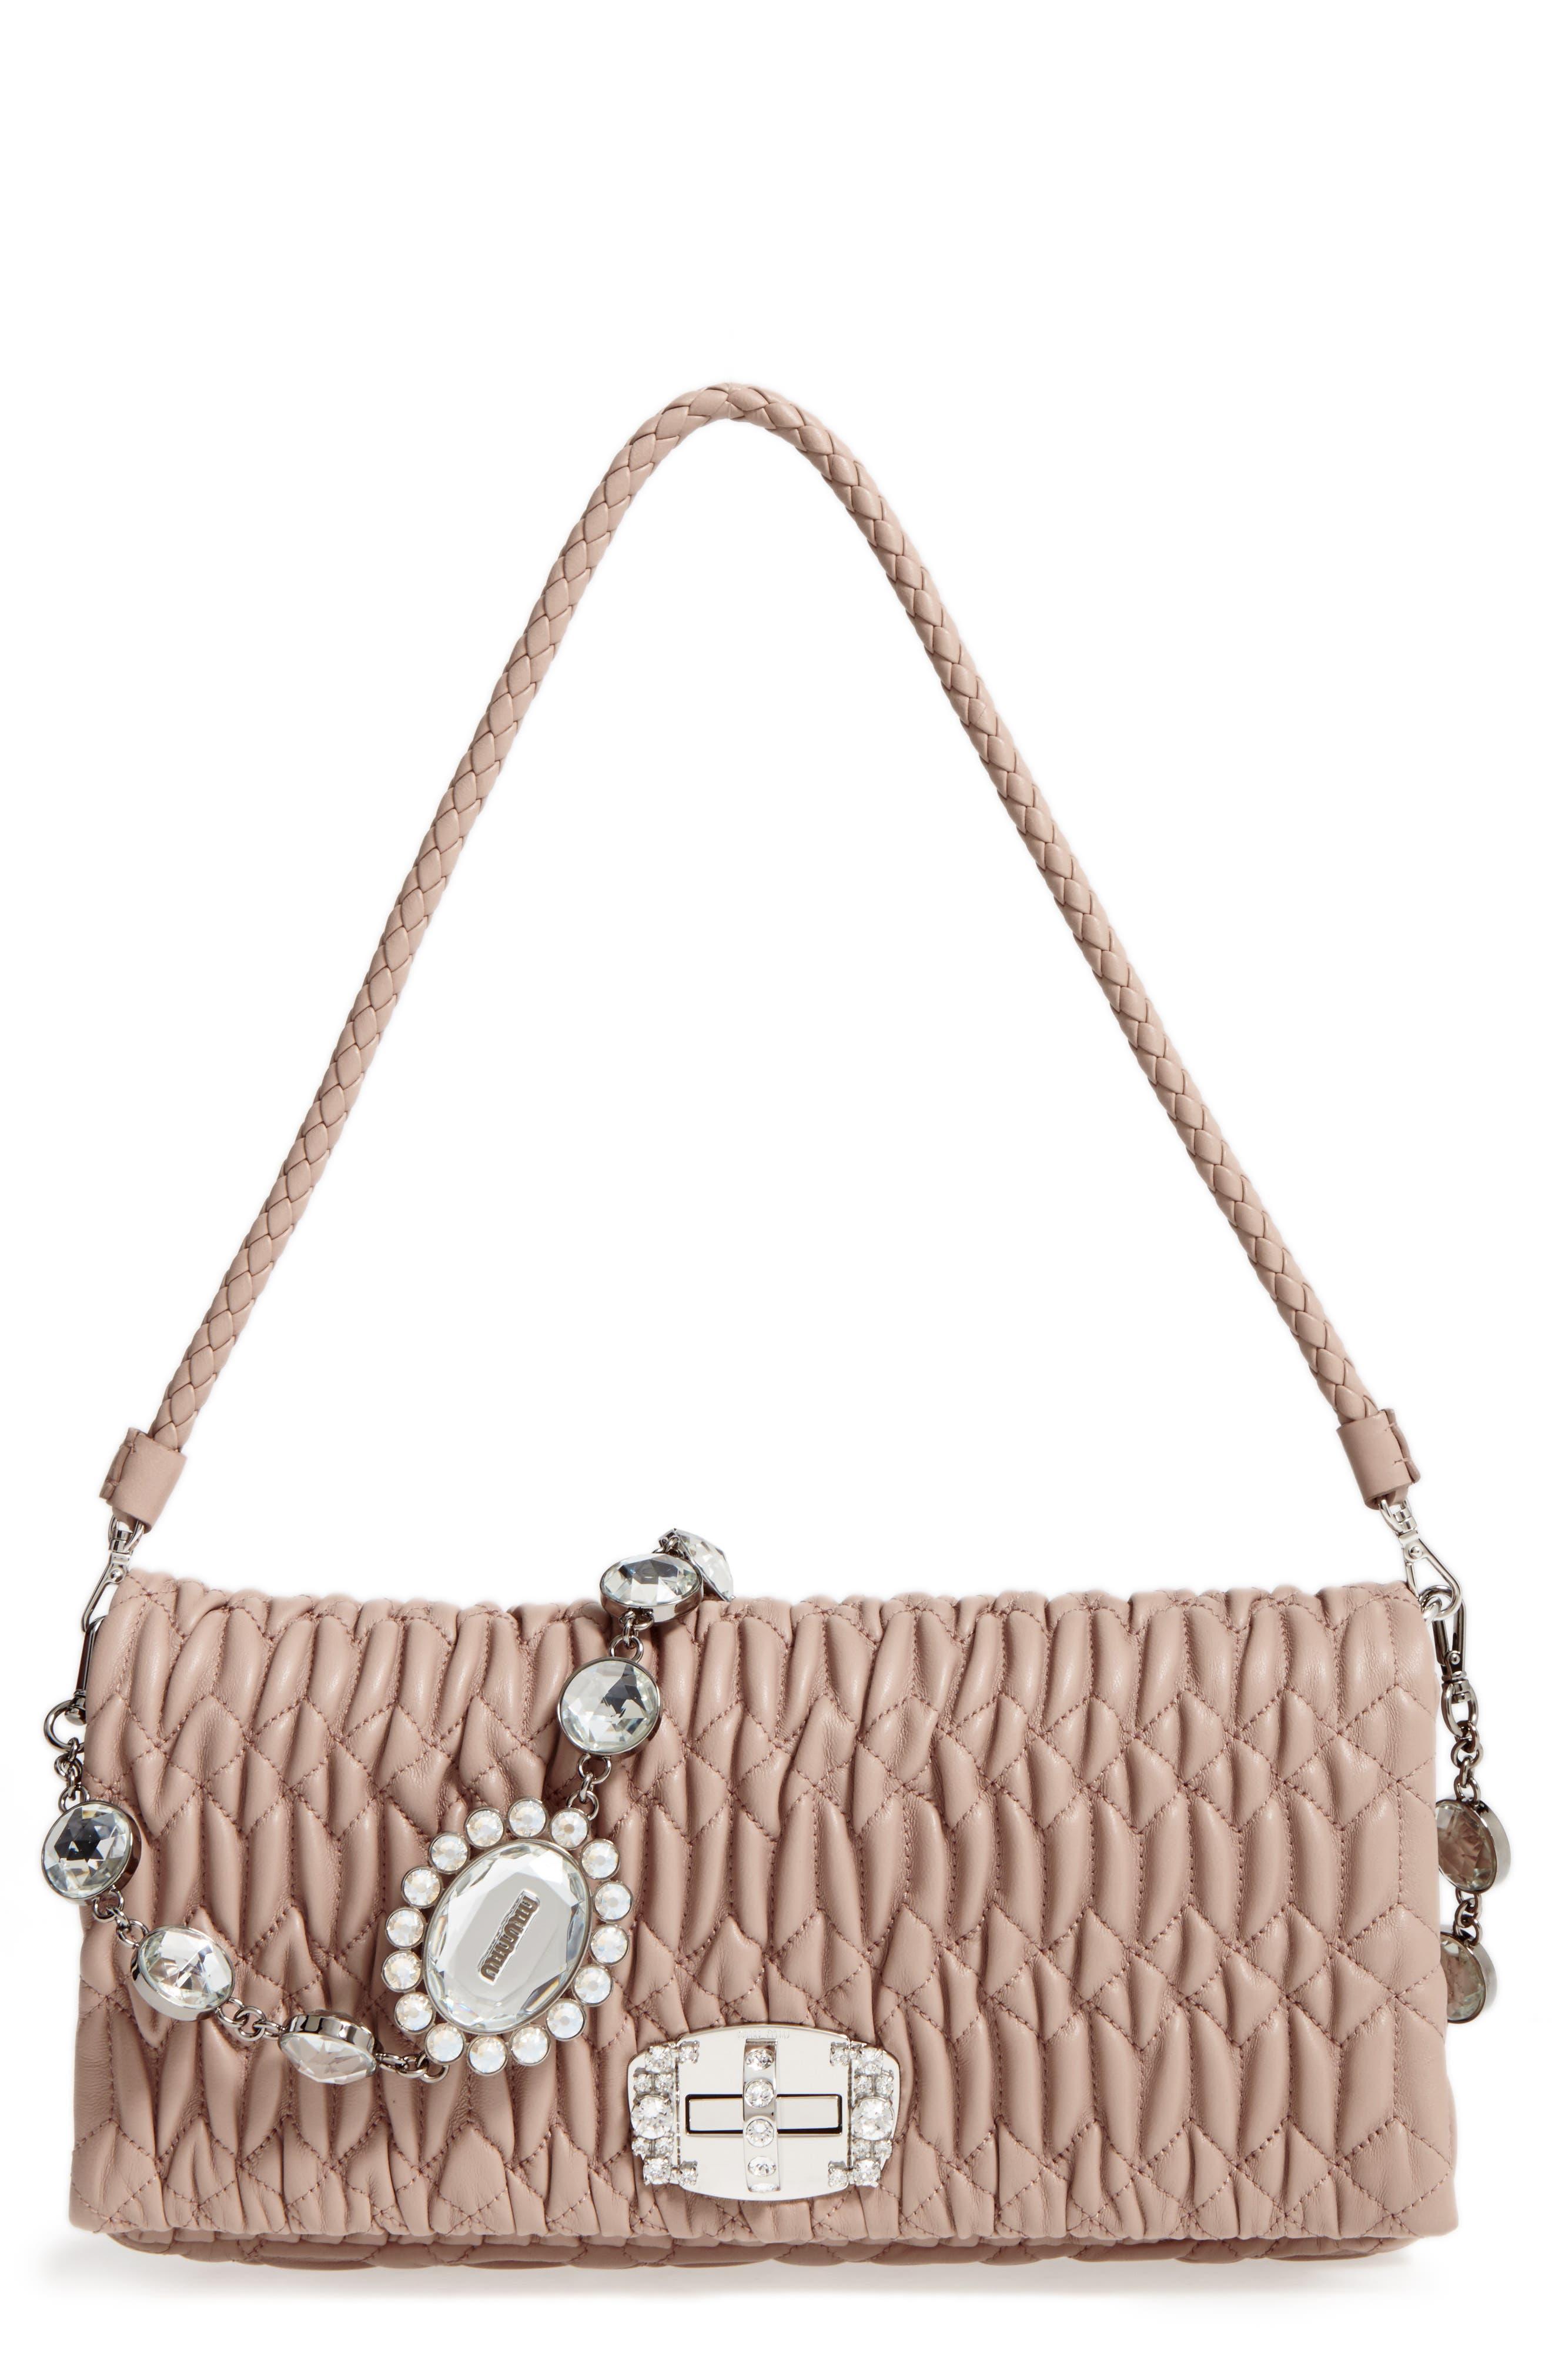 Alternate Image 1 Selected - Miu Miu Medium Crystal Matelassé Leather Crossbody Bag